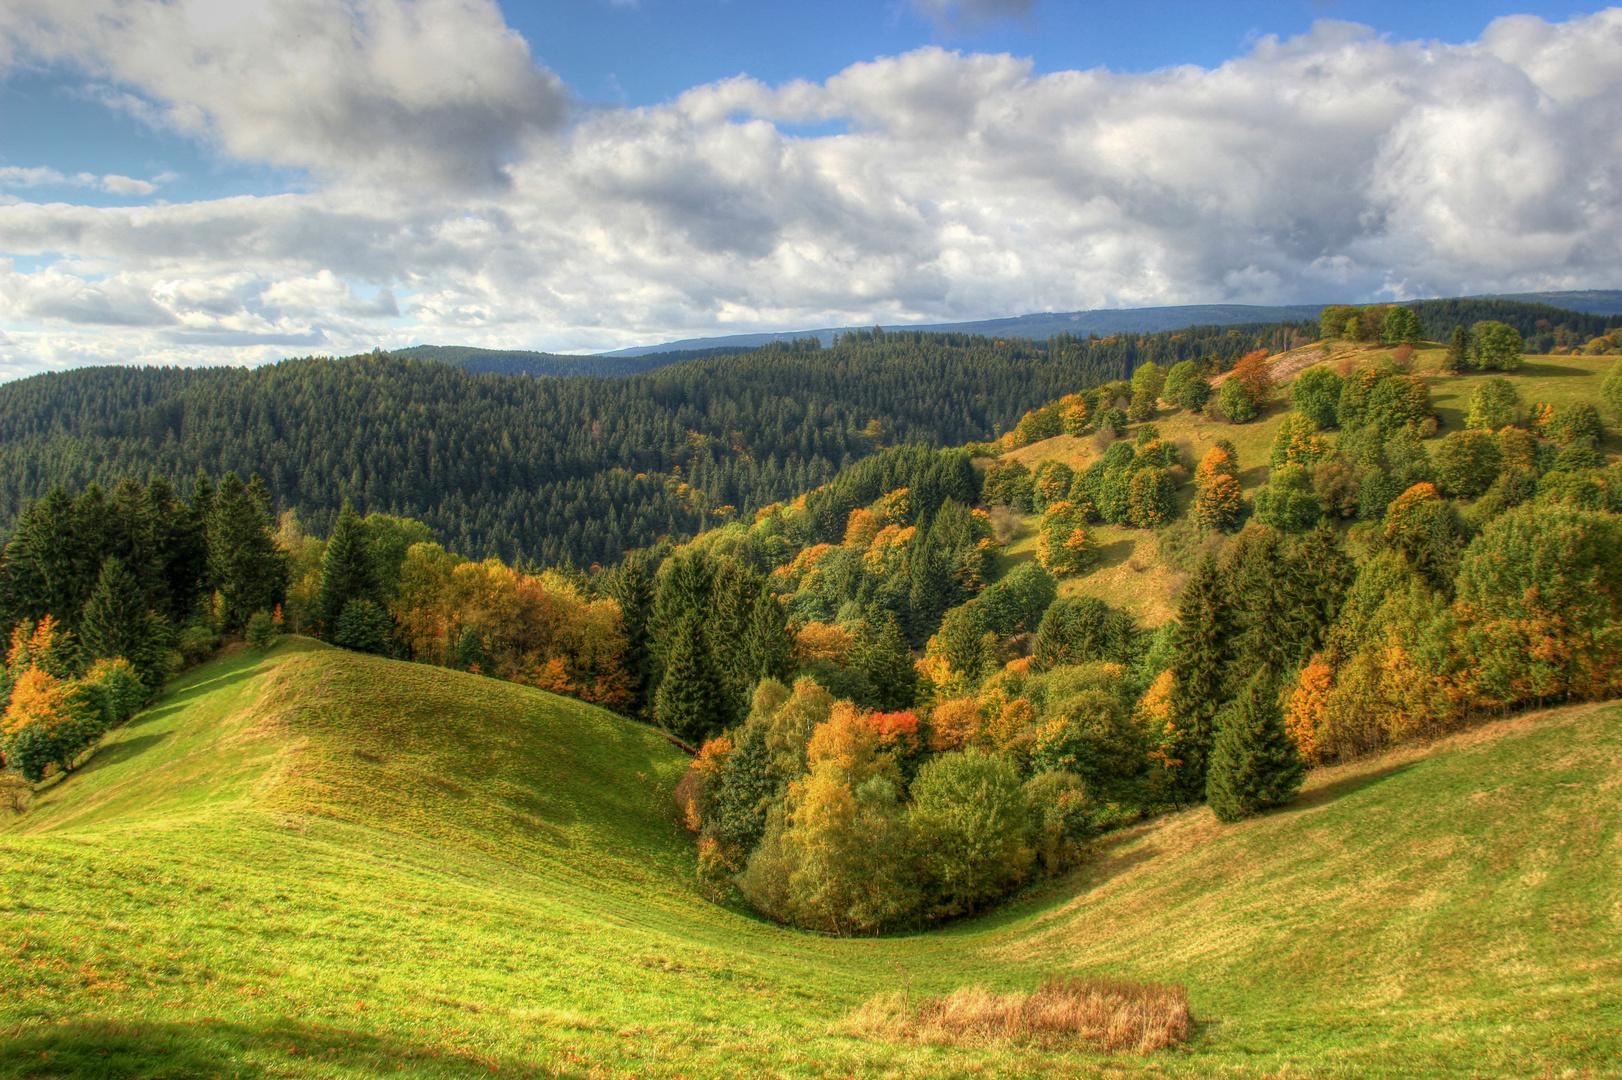 Herbstlicher Oberharz